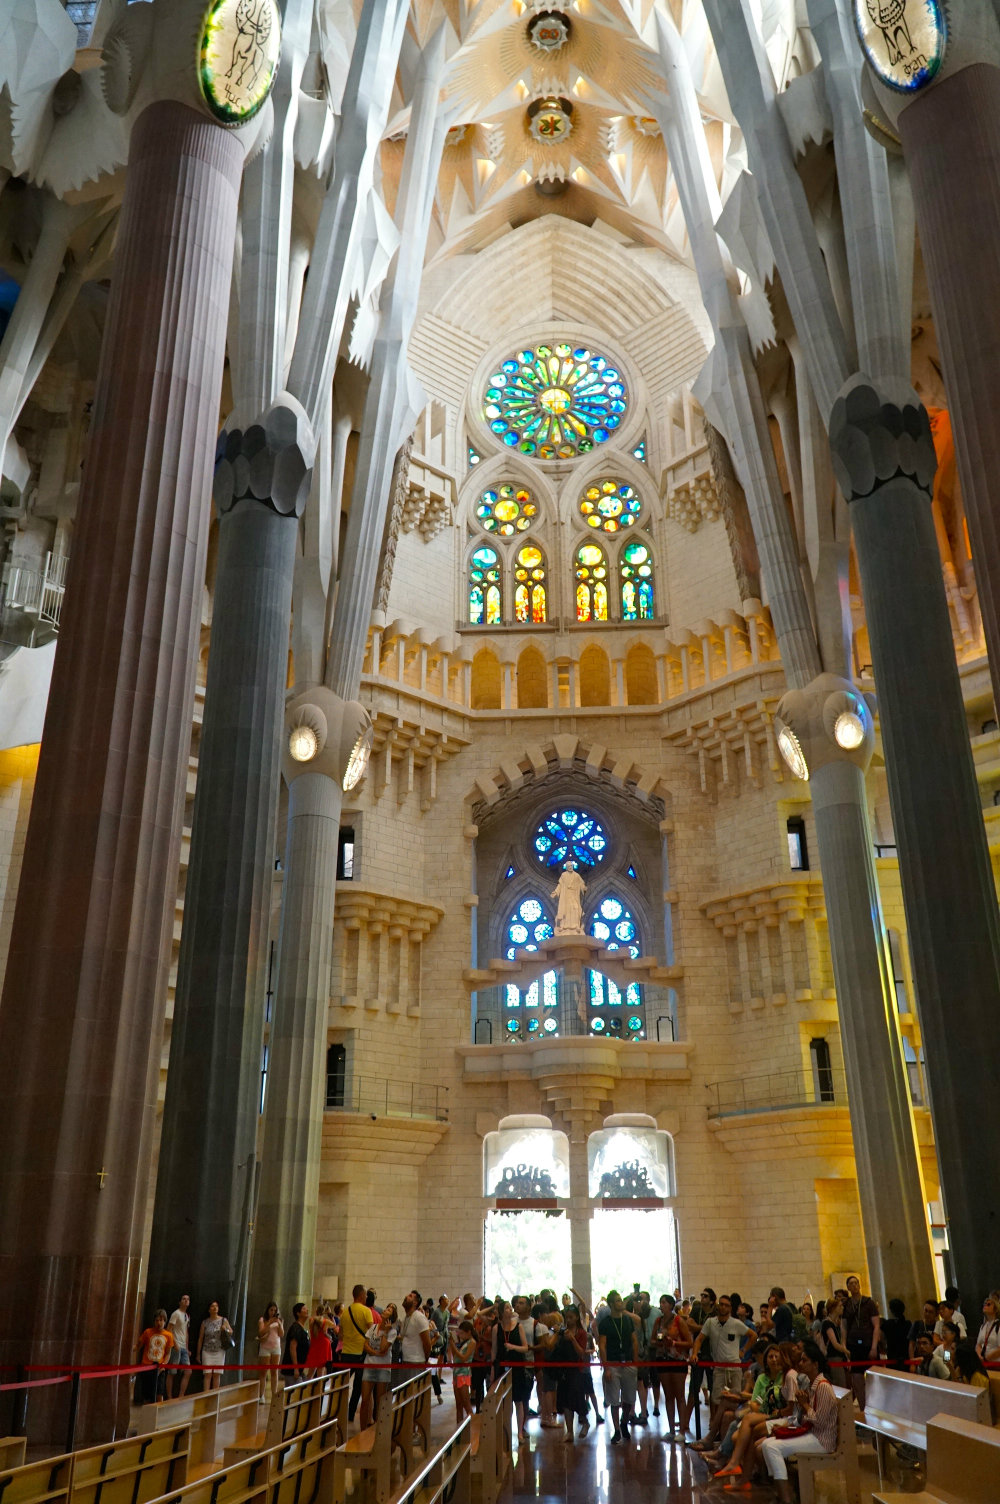 Walking inside of the Sagrada Familia by Gaudi in Barcelona.